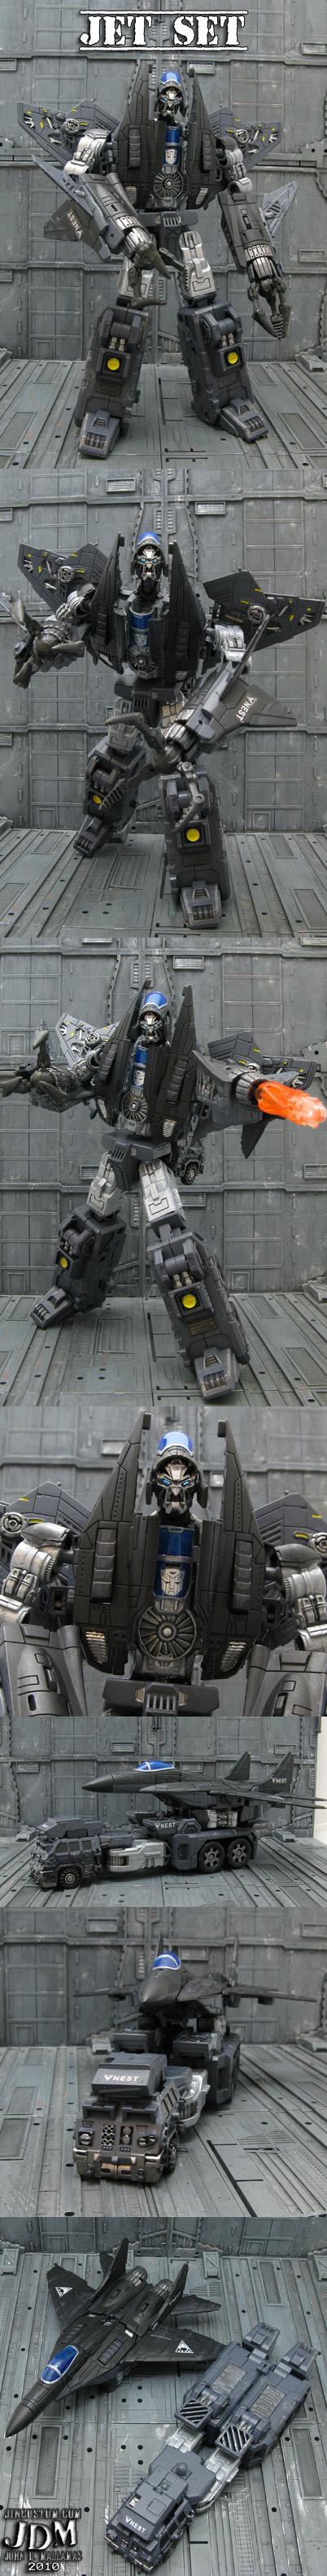 Jet Set Autobot